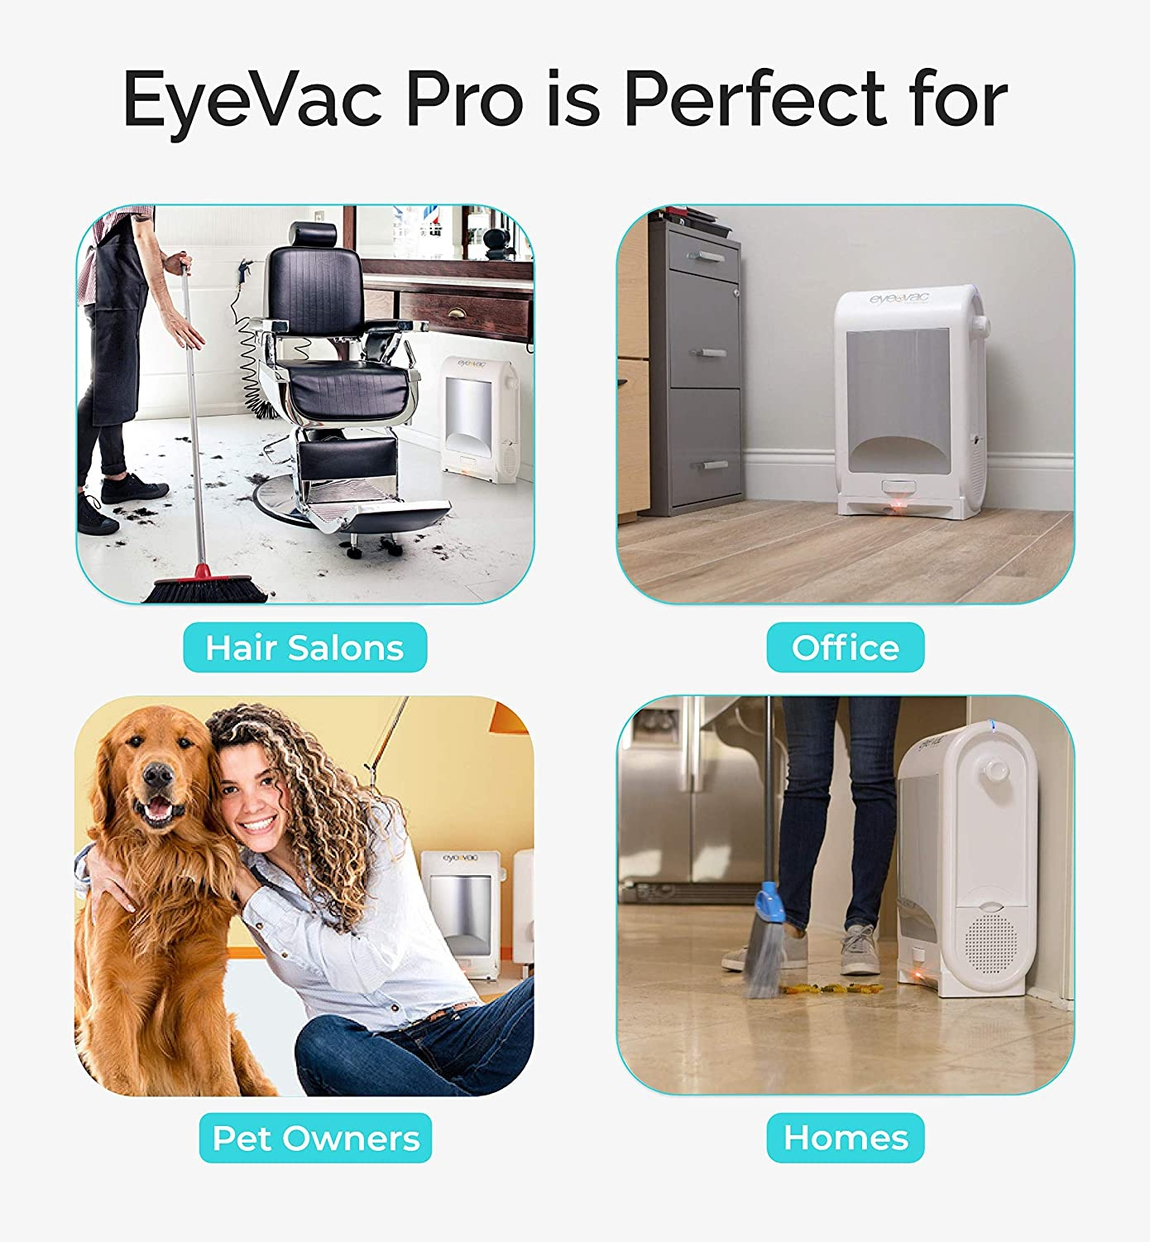 CrowleyJones(クローリージョーンズ) Eye-Vac Professional Vacuum Cleaner EVPRO-Wの商品画像5